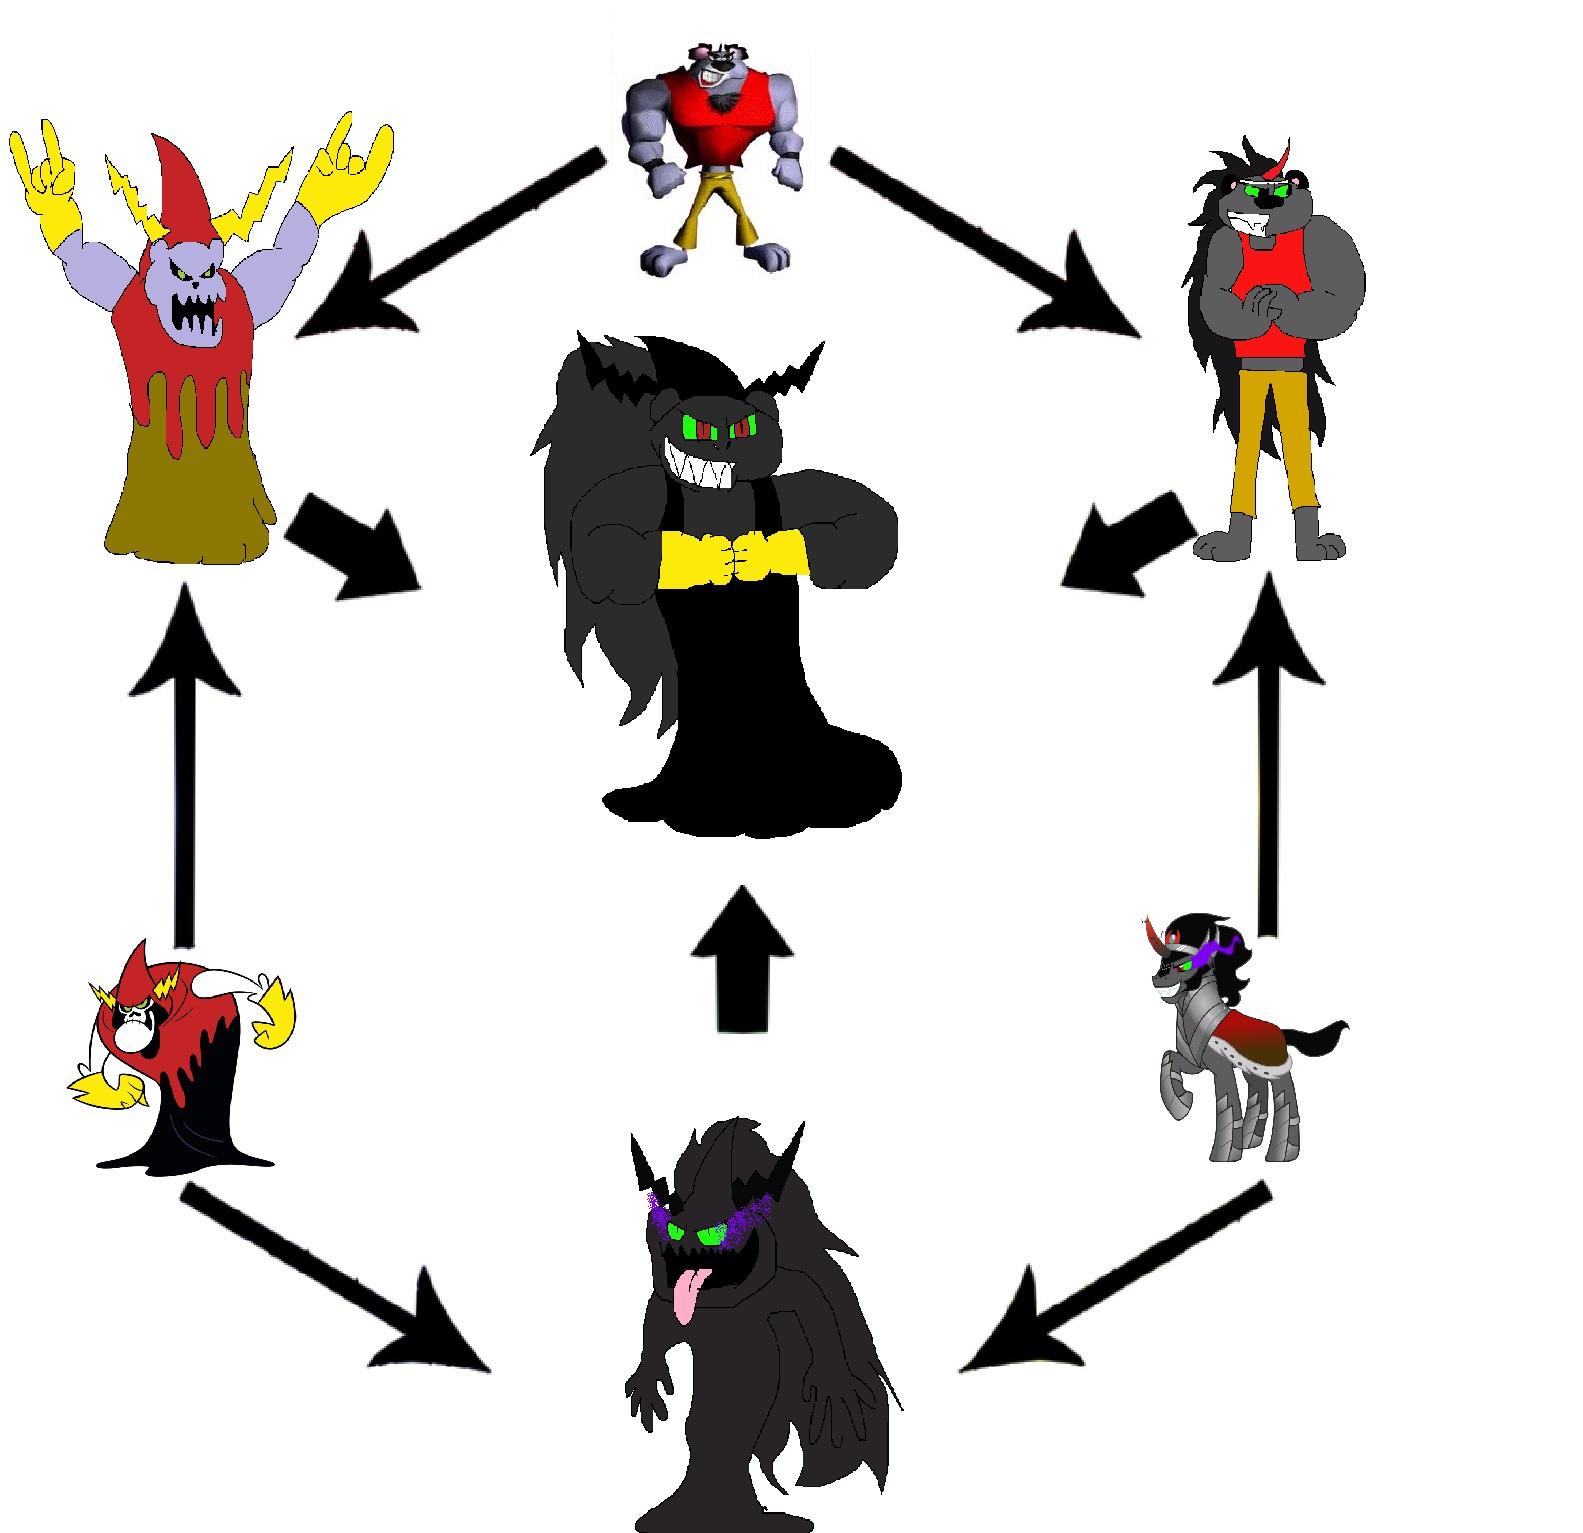 Koala Kong,Lord Hater and King Somba Hexafusion by Rainbow-Dash-Rockz